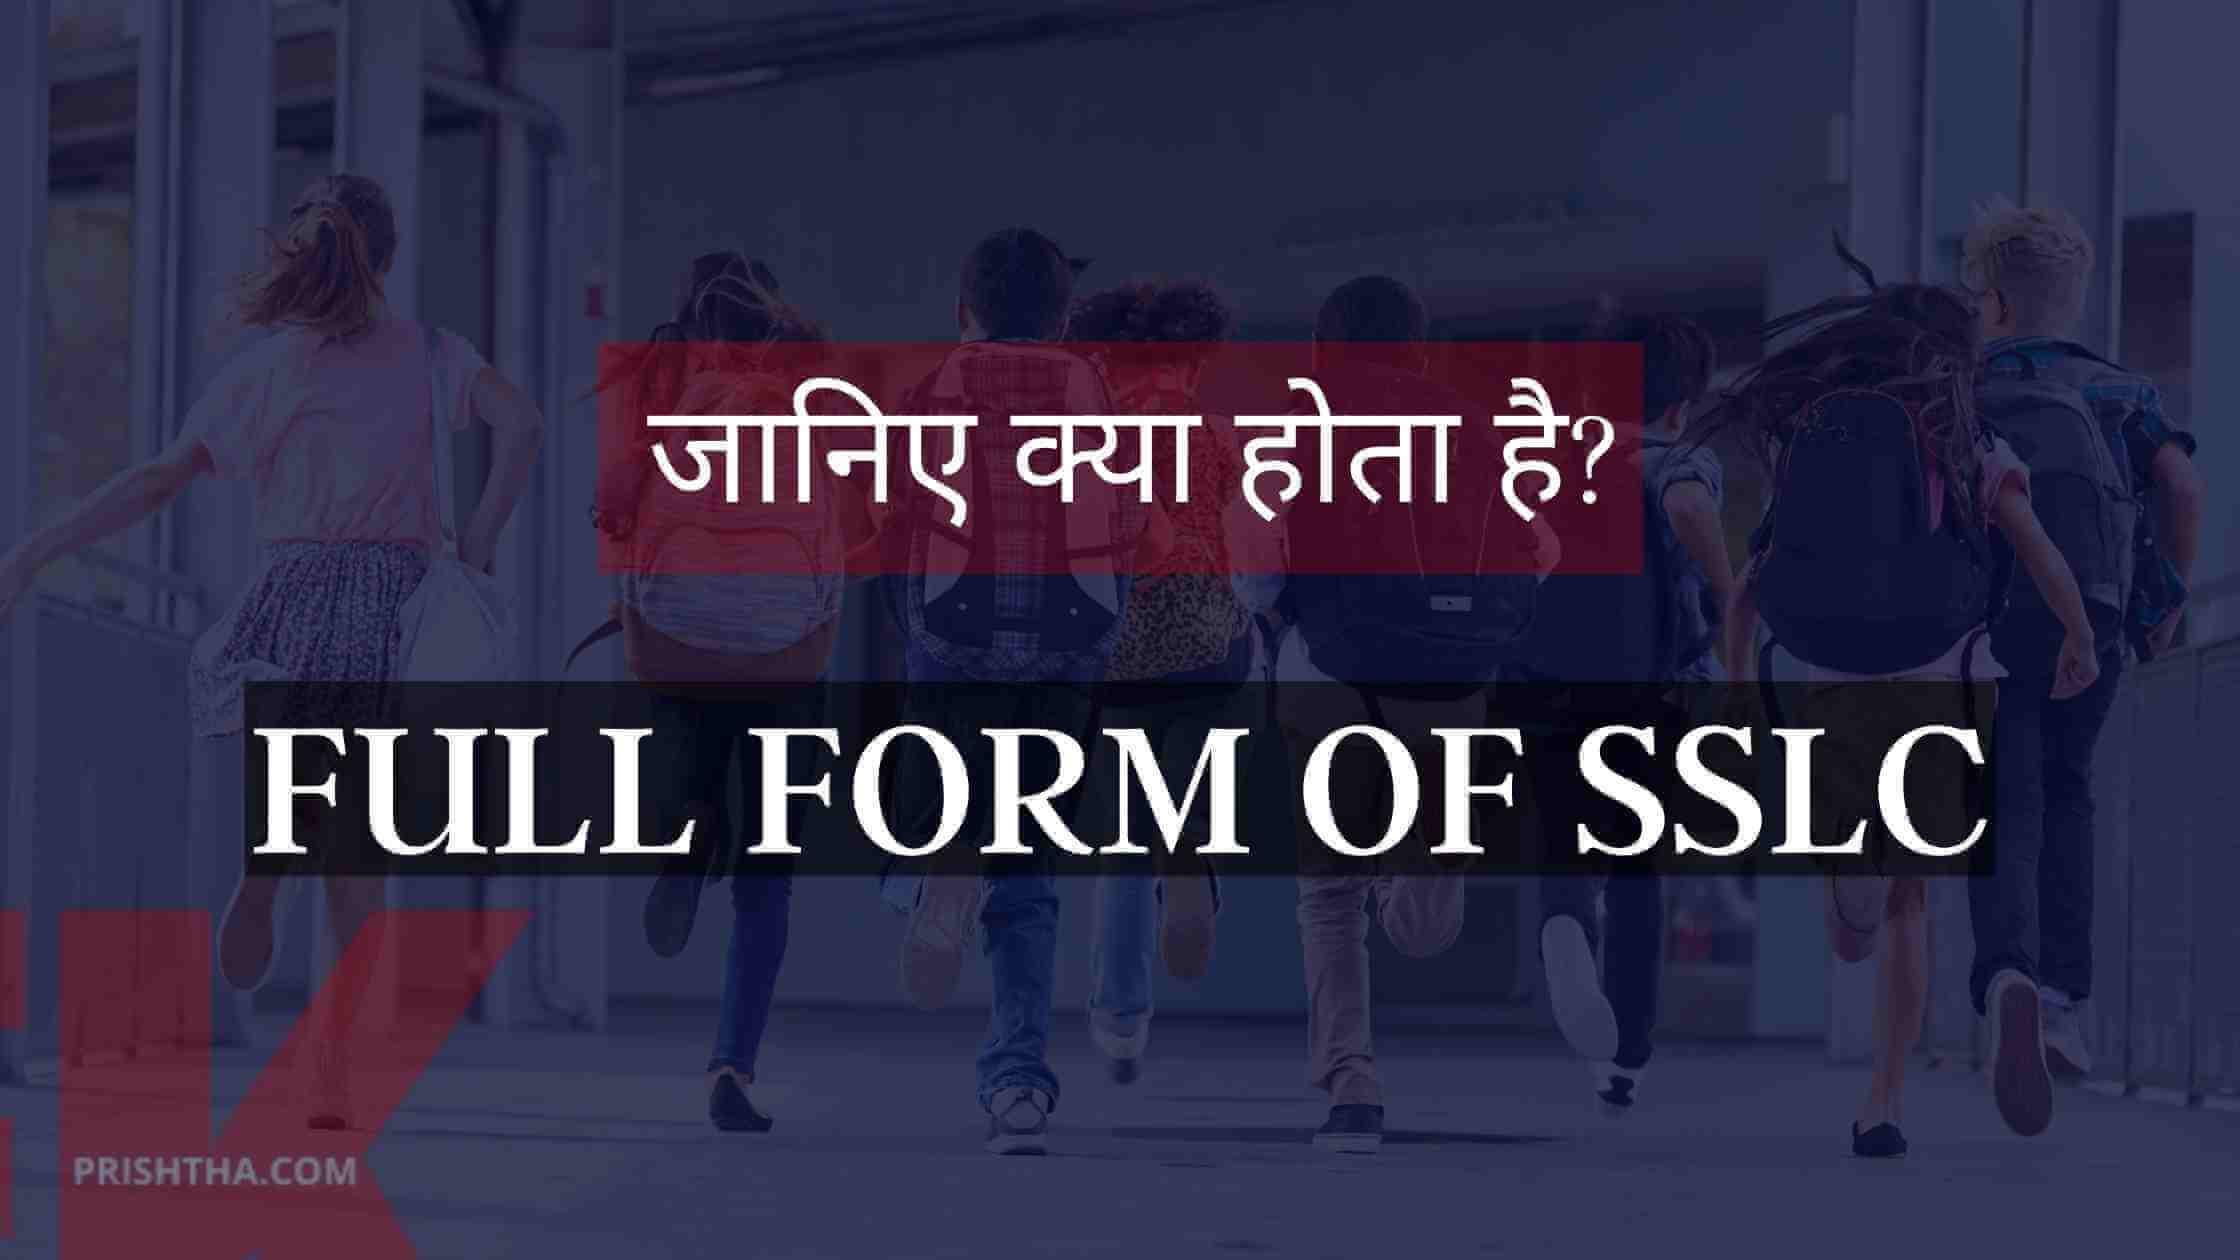 sslc full form in hindi